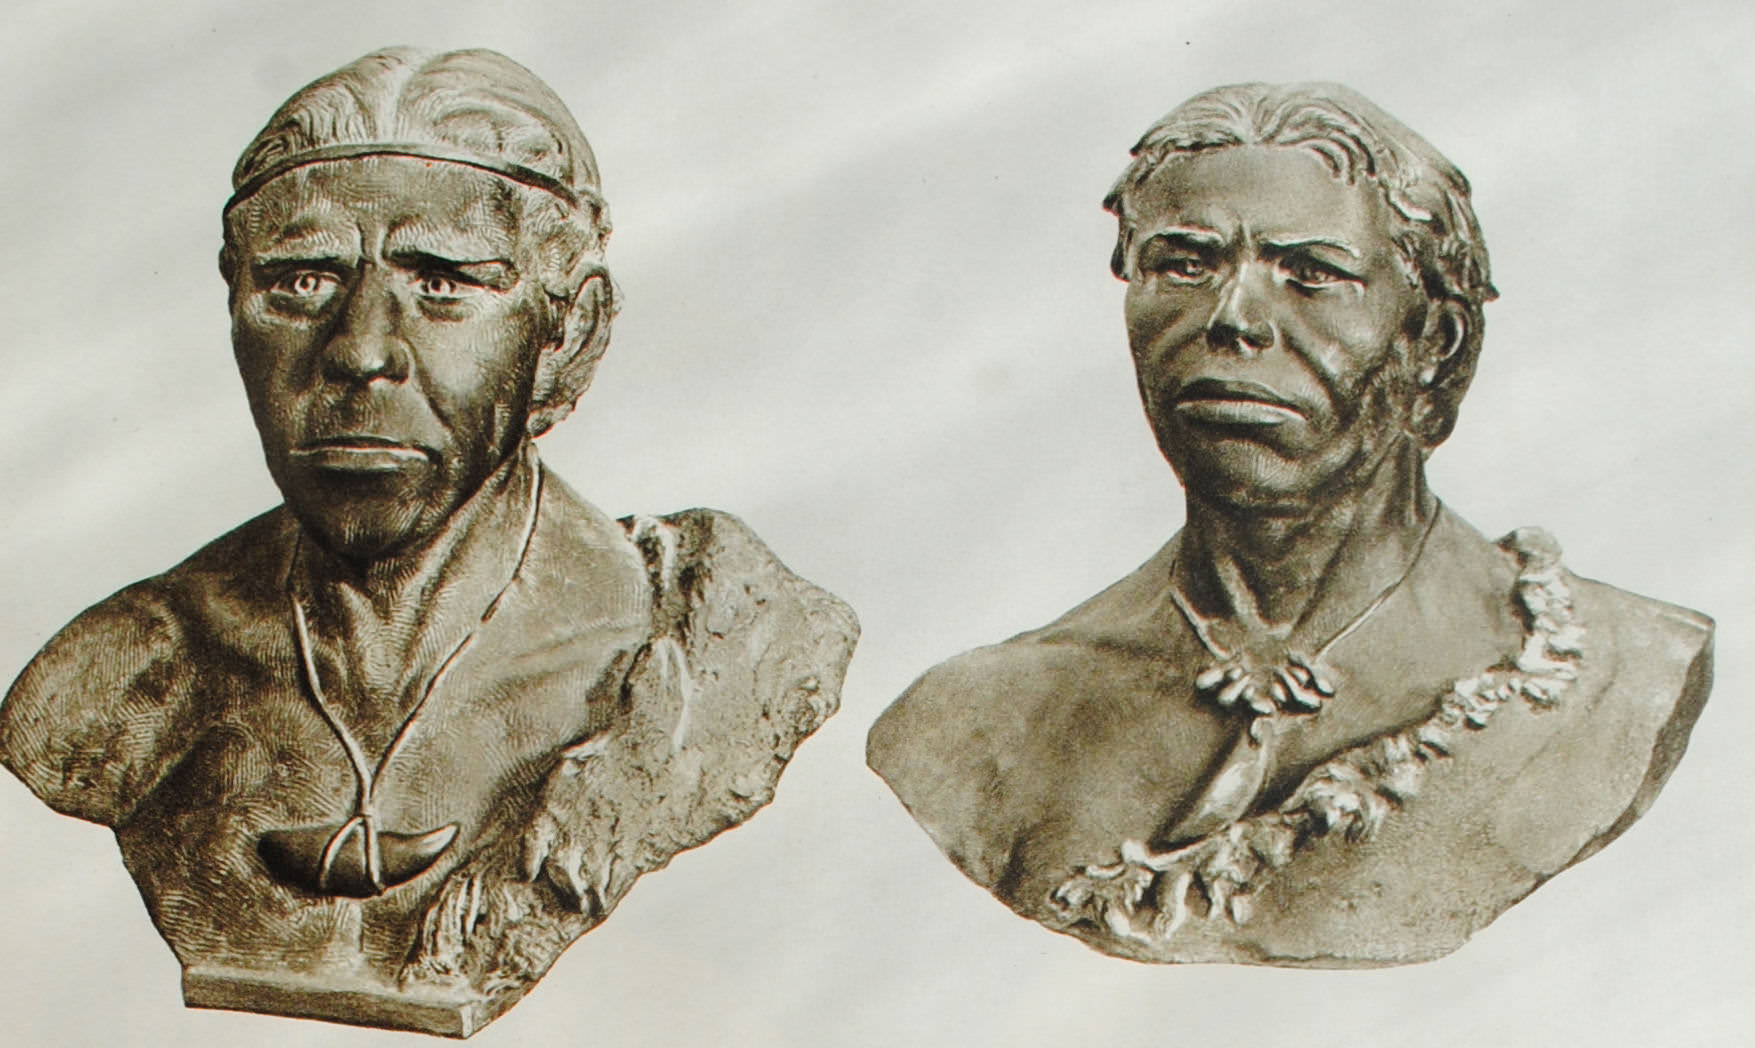 Кроманьонцы. Реконструкция М.М. Герасимова 1945г. Слева - по черепу из Кро-Маньона (Франция), справа - по черепу из Ком-Копеля (Франция).